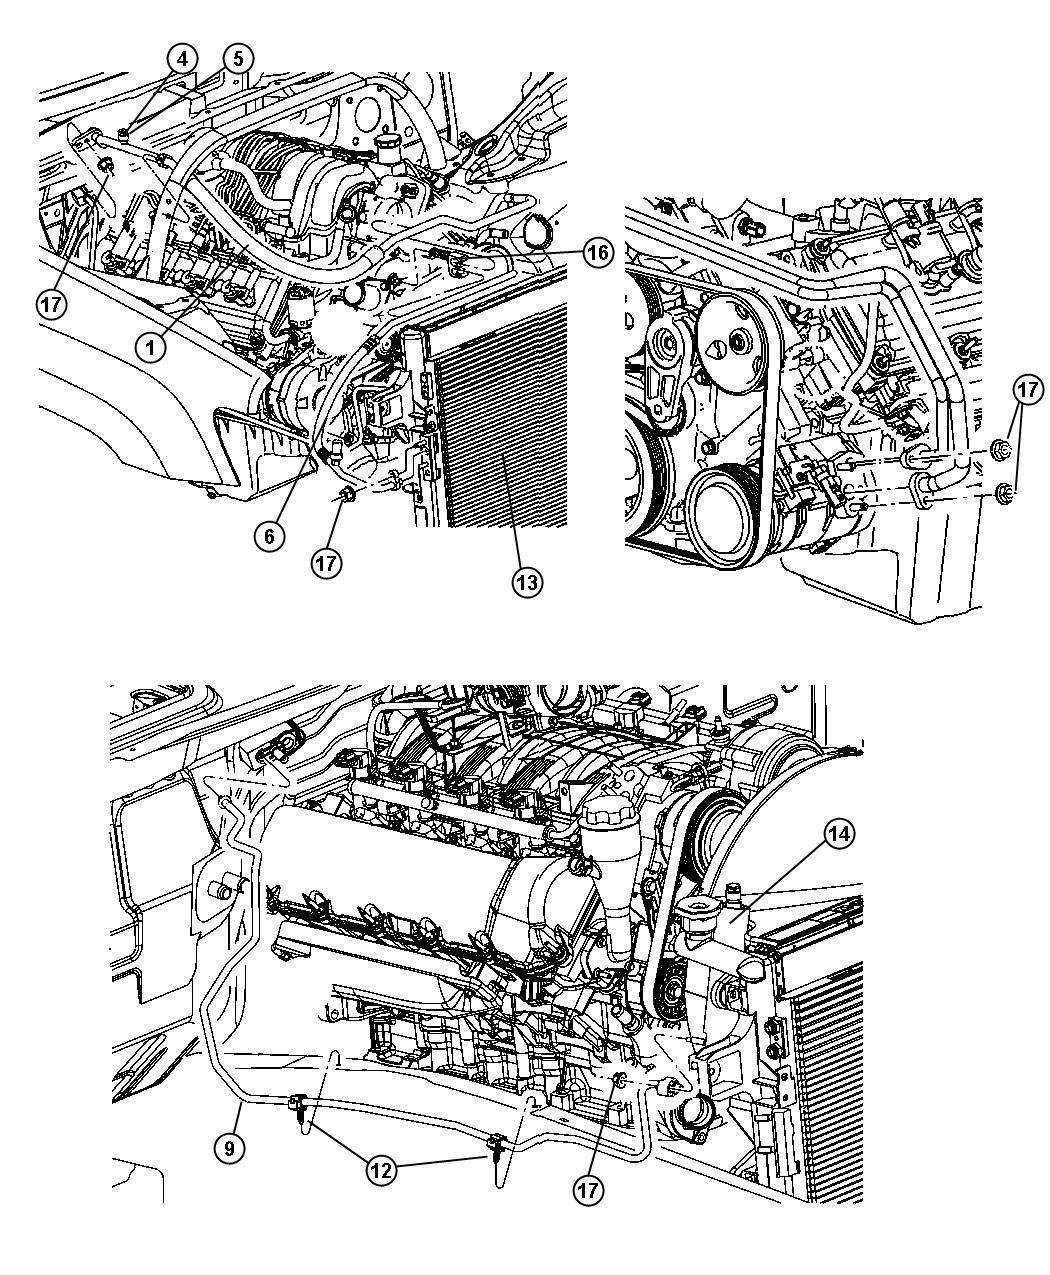 Jeep Grand Cherokee Valve. A/c pressure transducer. Ens